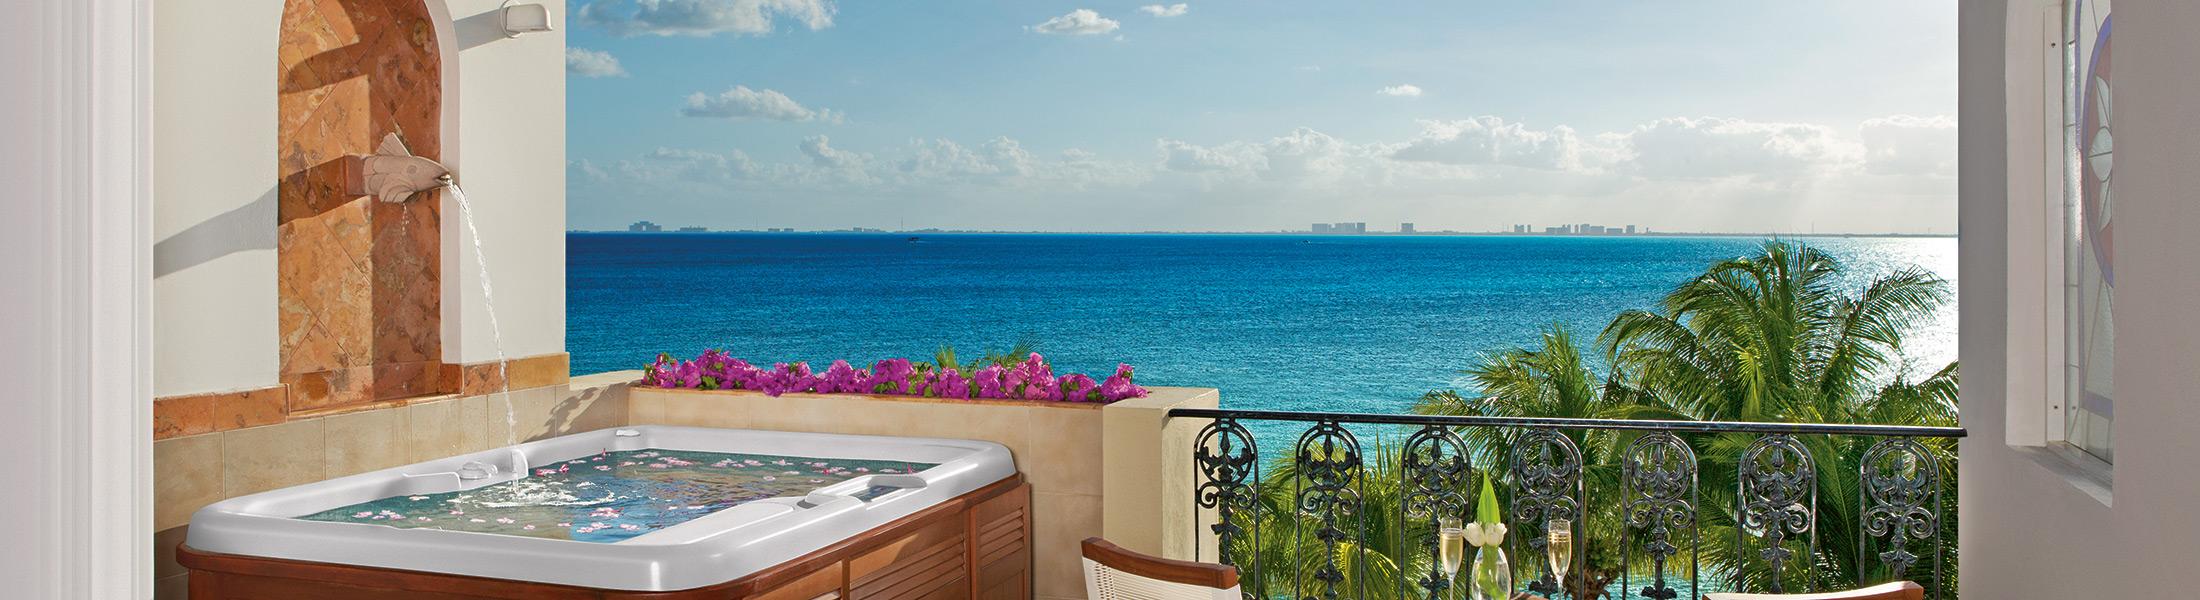 Jucuzzi on a balcony at Zoetry Villa Rolandi Isla Mujeres